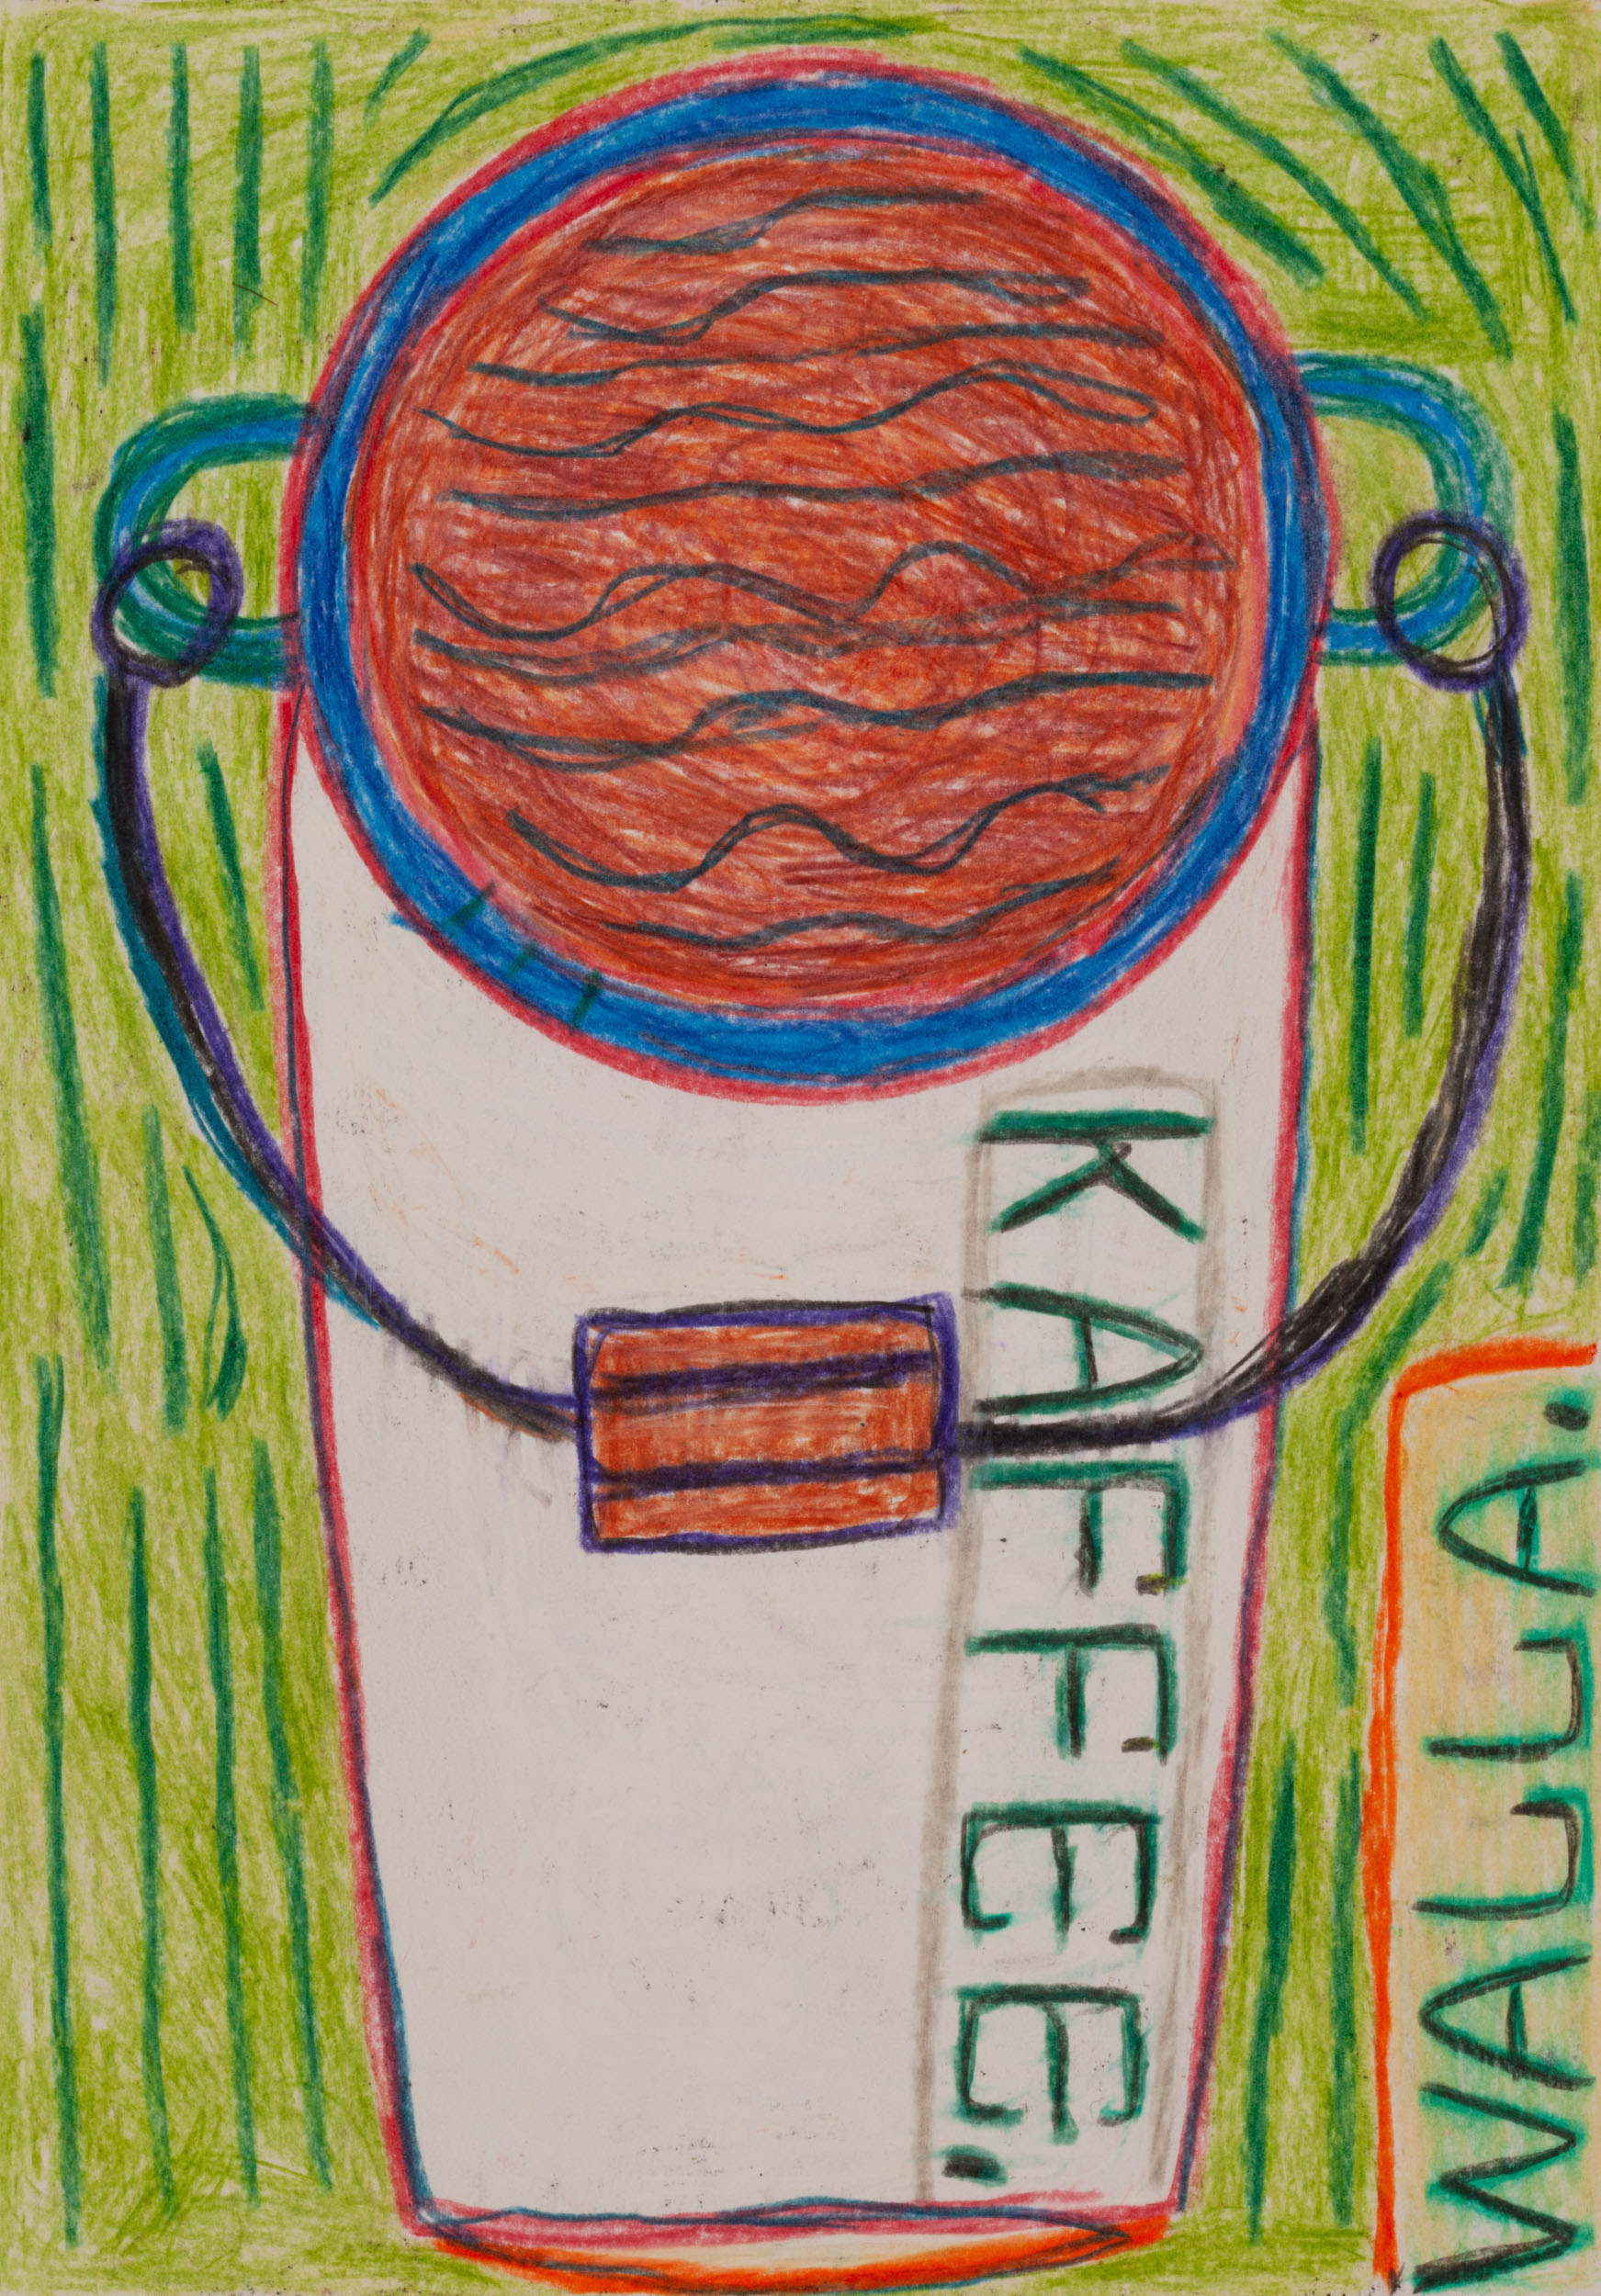 walla august - KAFFEE. / COFFEE.